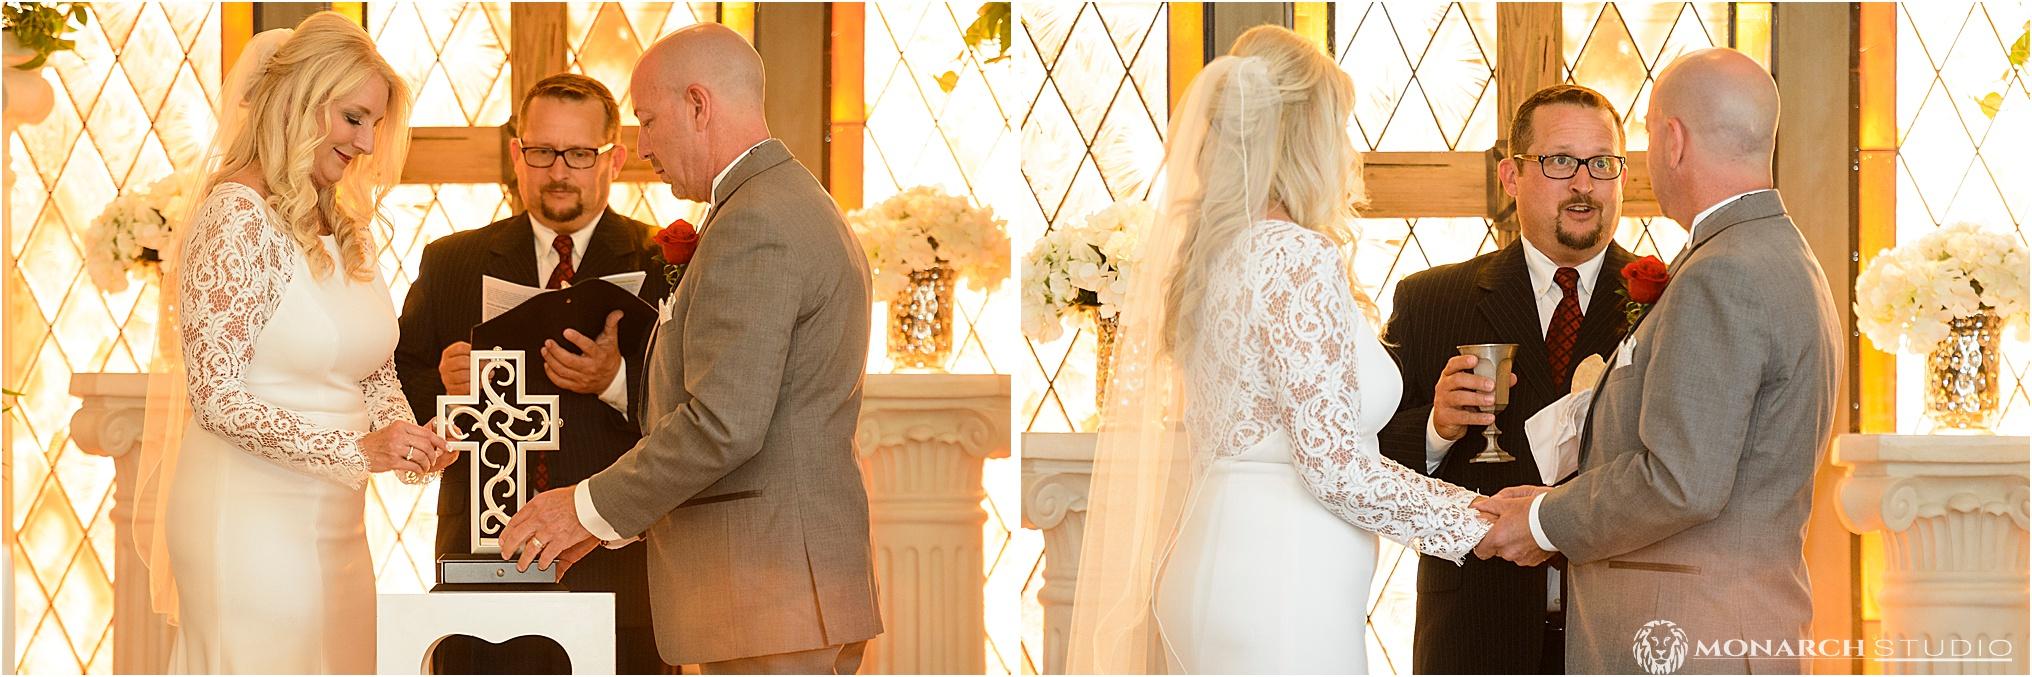 june-2019-saint-augustine-wedding-016.jpg